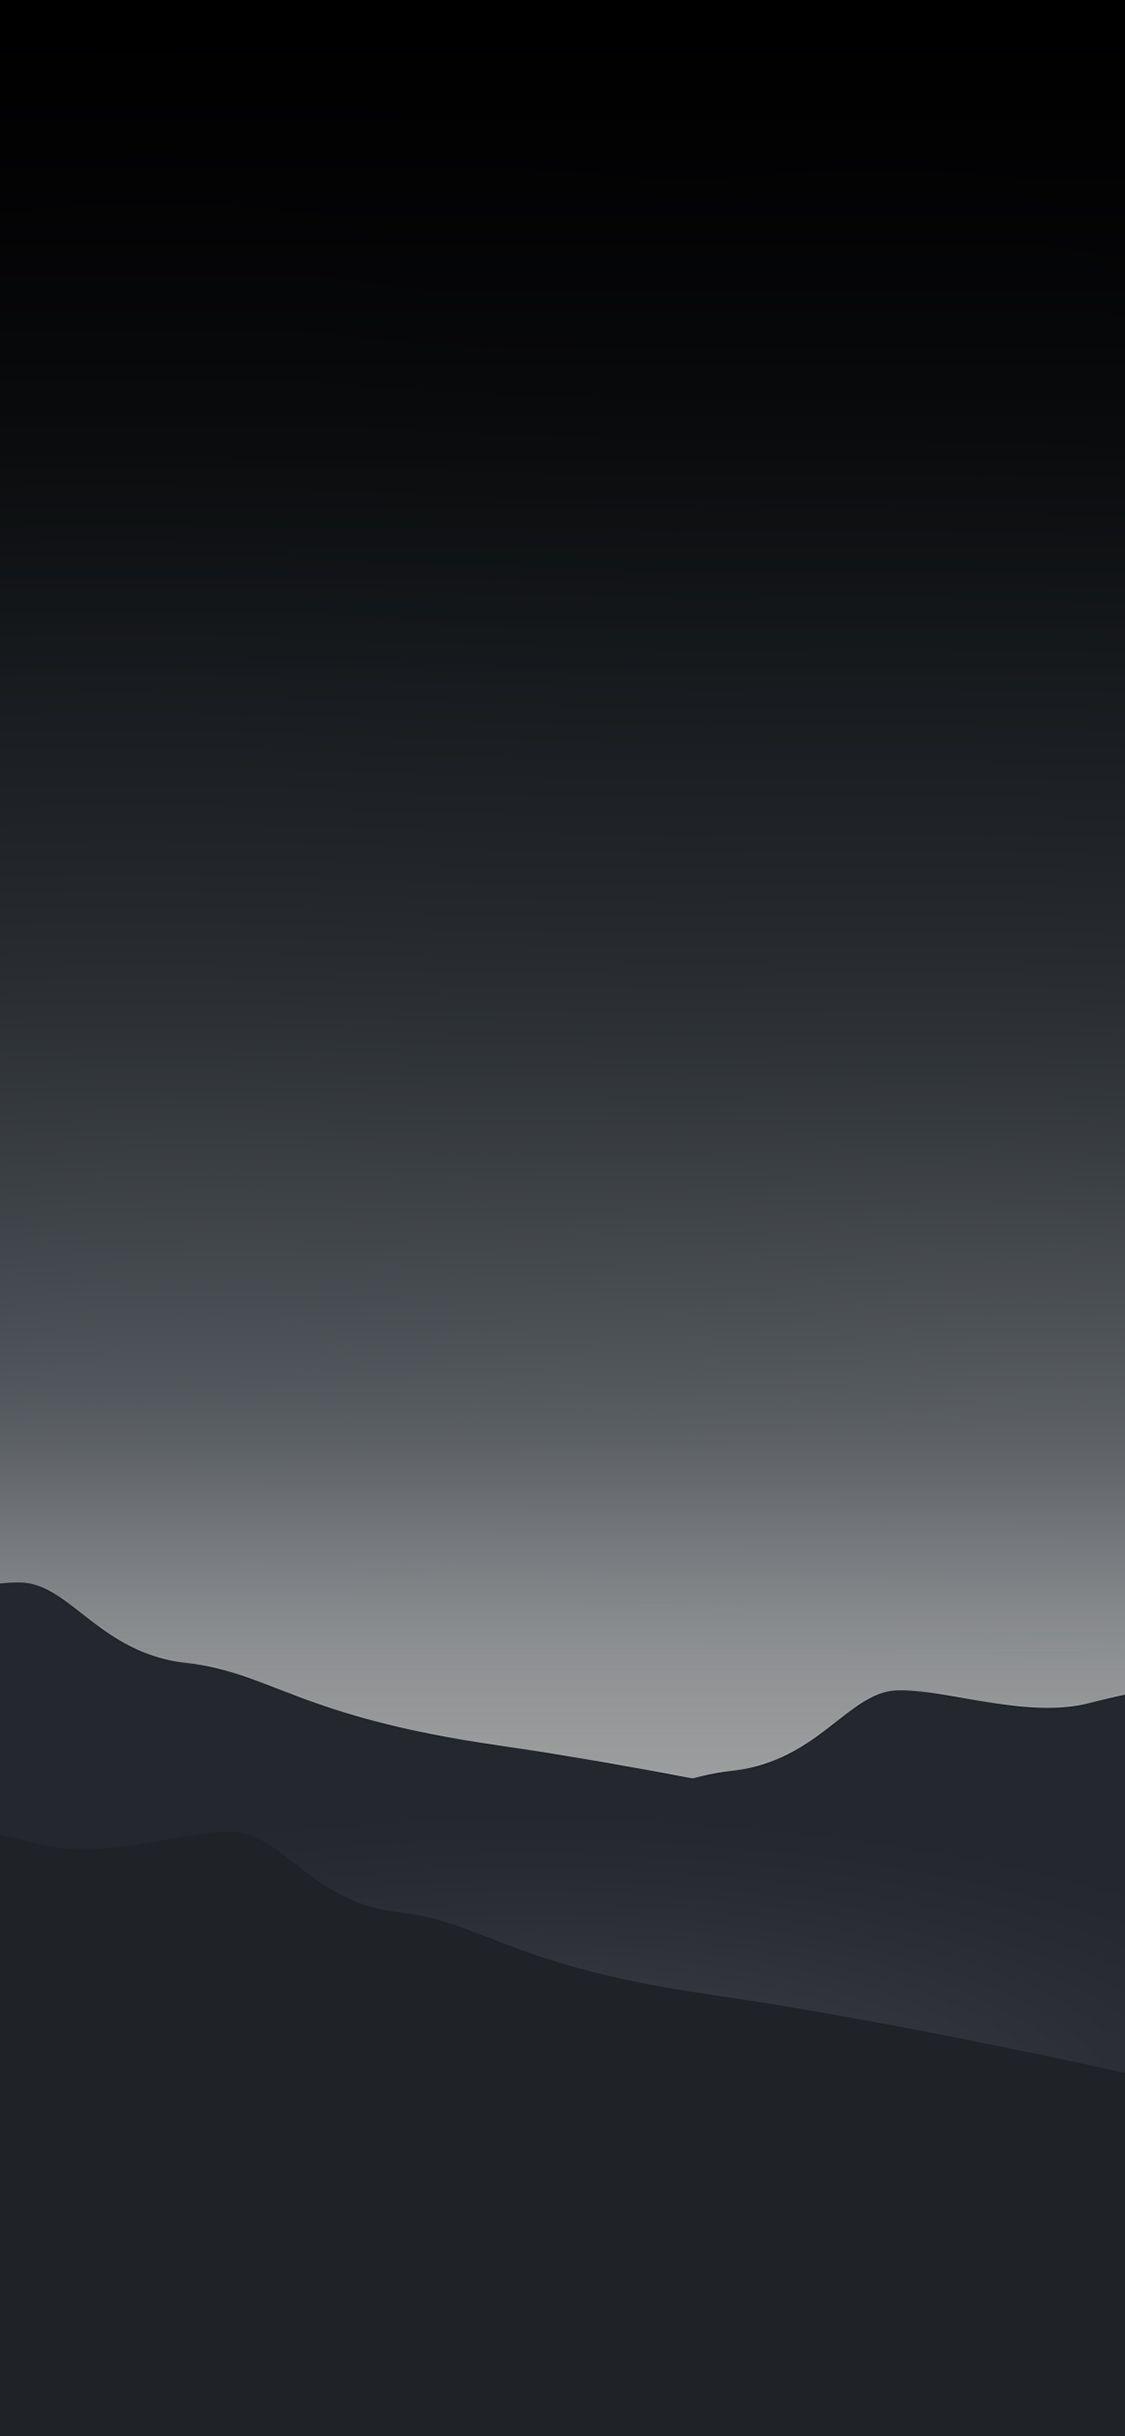 Dark Planet Iphone X Xs Wallpaper Iphone Minimalist Wallpaper Iphone Wallpaper Black Aesthetic Wallpaper